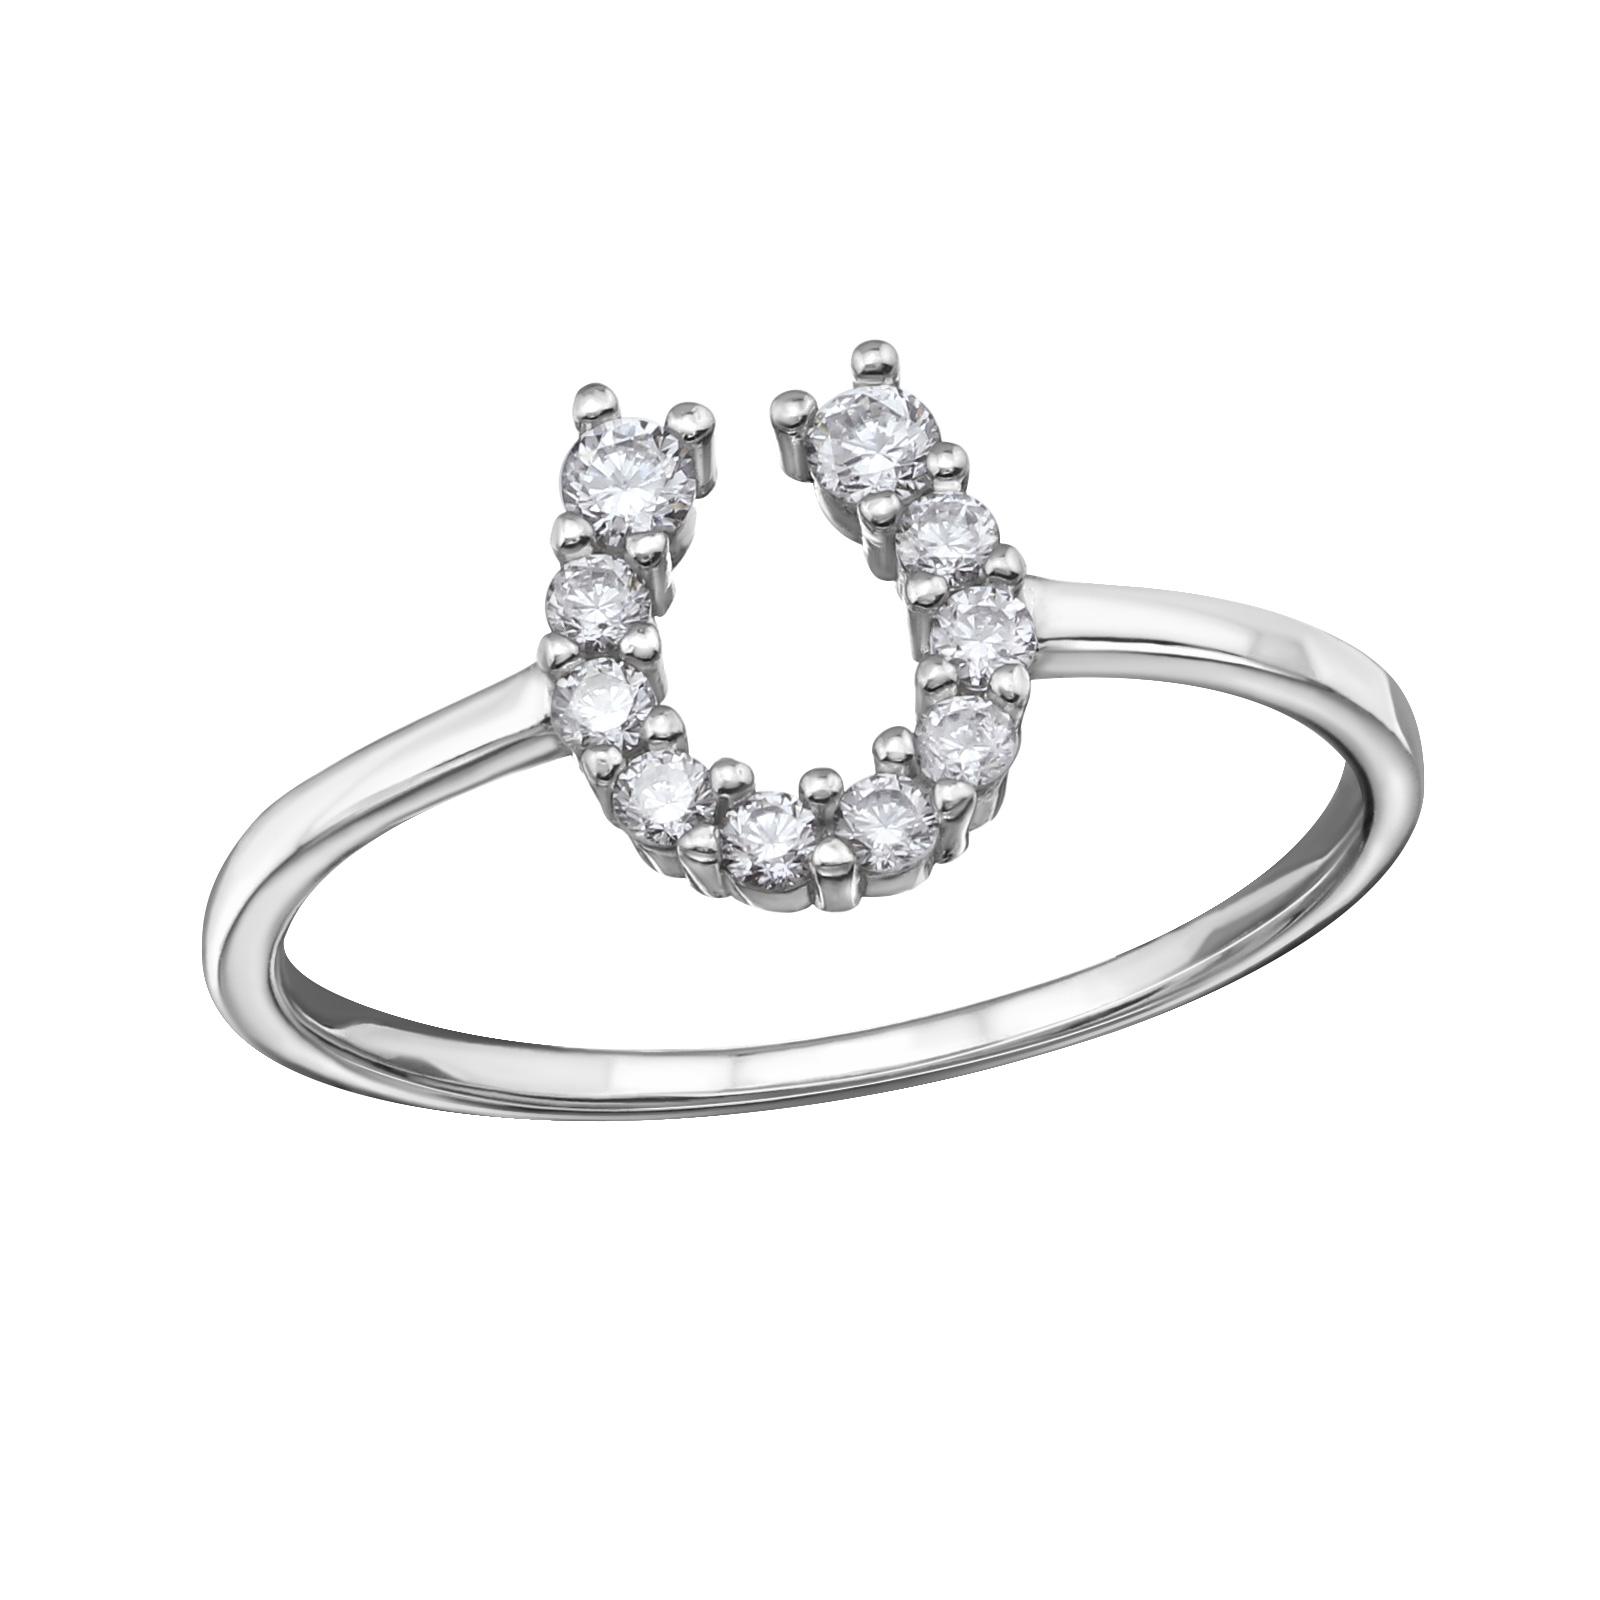 OLIVIE Stříbrný prsten PODKOVA 1238 Velikost: 8 (EU: 57 - 58)